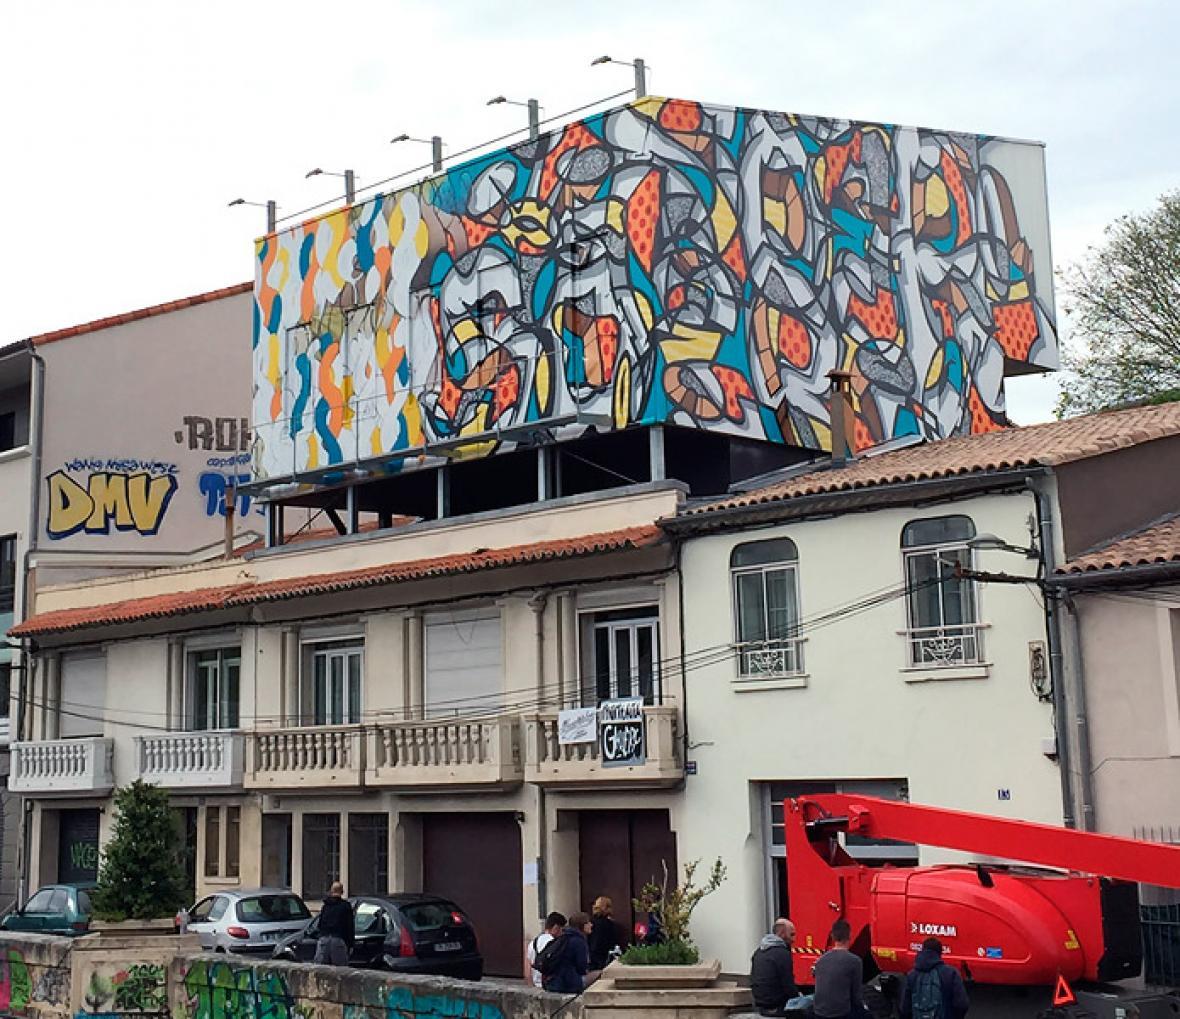 Grafiti de Rezo, en Montpellier, sur de Francia.